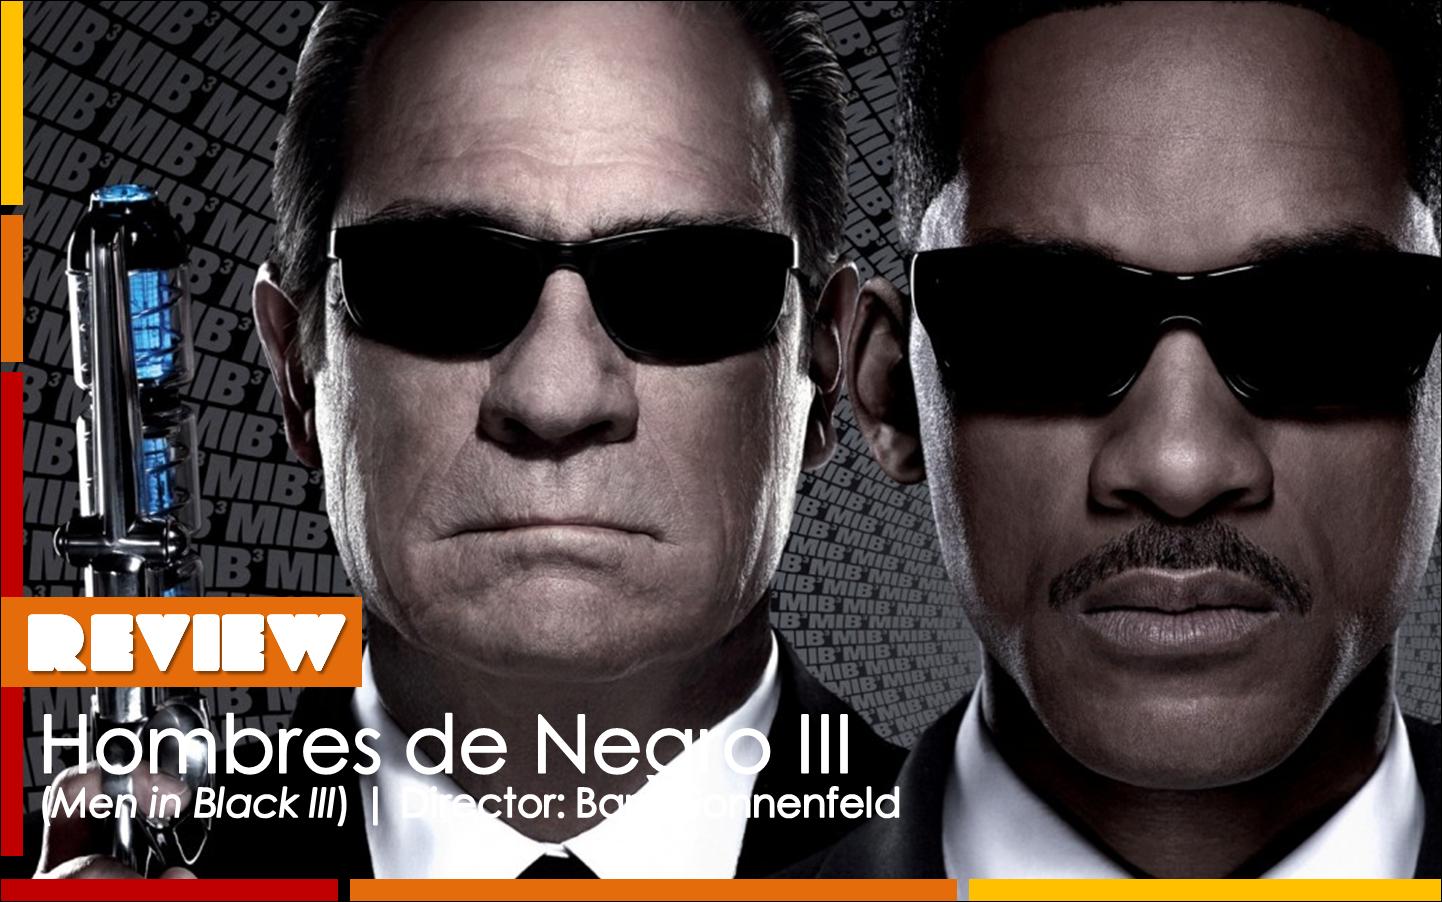 http://4.bp.blogspot.com/-9ZyKFi_ePzw/T78Uk-7aTjI/AAAAAAAACJY/ljaYLTCWebw/s1600/Review+Hombres+de+Negro+III.png